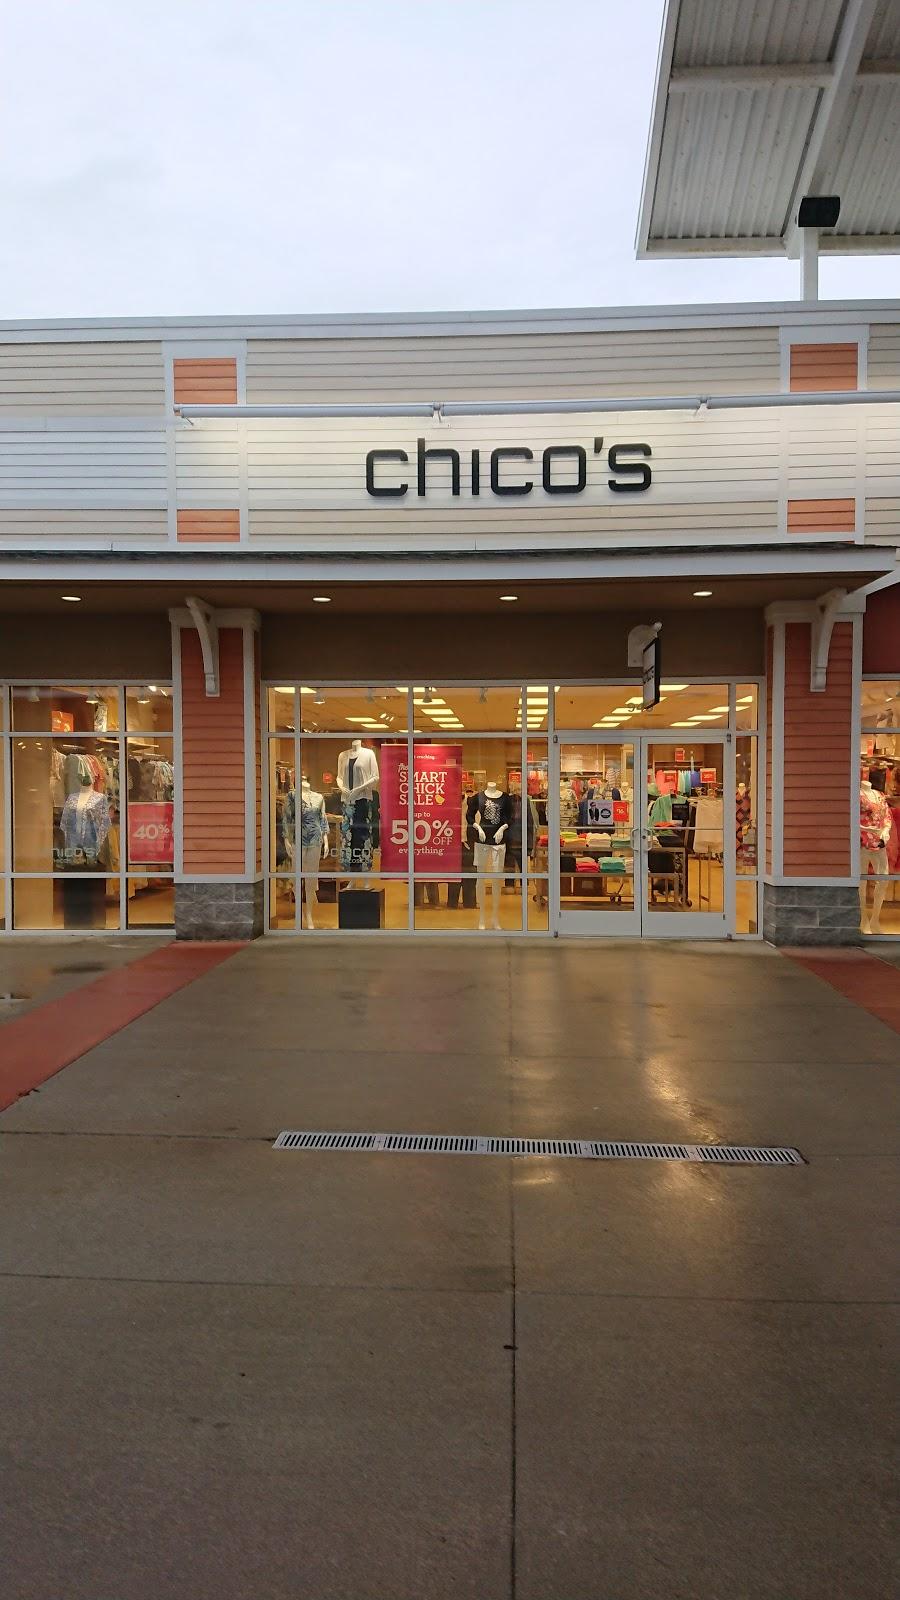 Chicos Off The Rack - jewelry store  | Photo 1 of 3 | Address: 2200 Tanger Blvd Ste 940, Washington, PA 15301, USA | Phone: (724) 228-1405